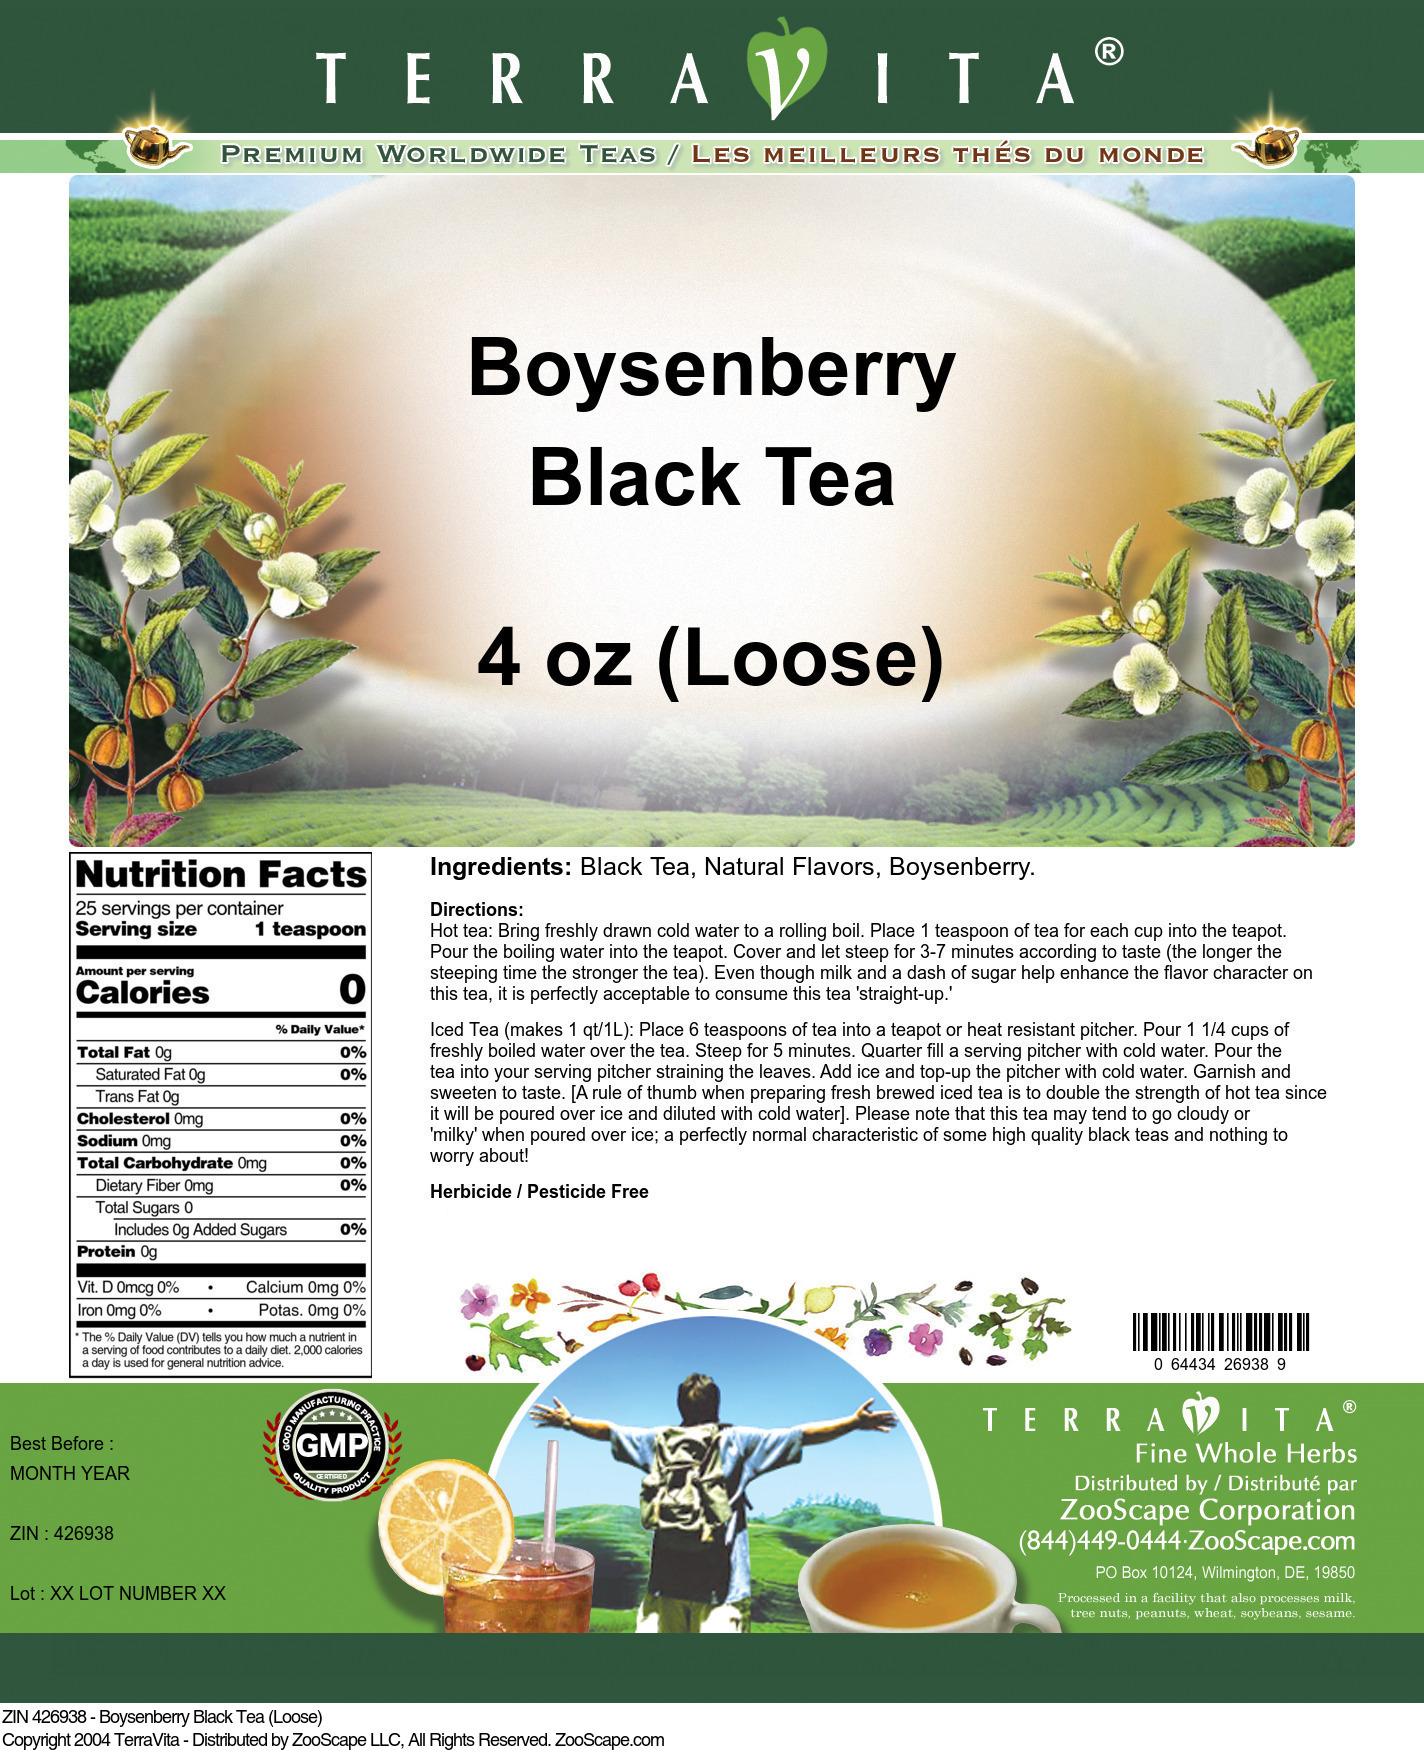 Boysenberry Black Tea (Loose)